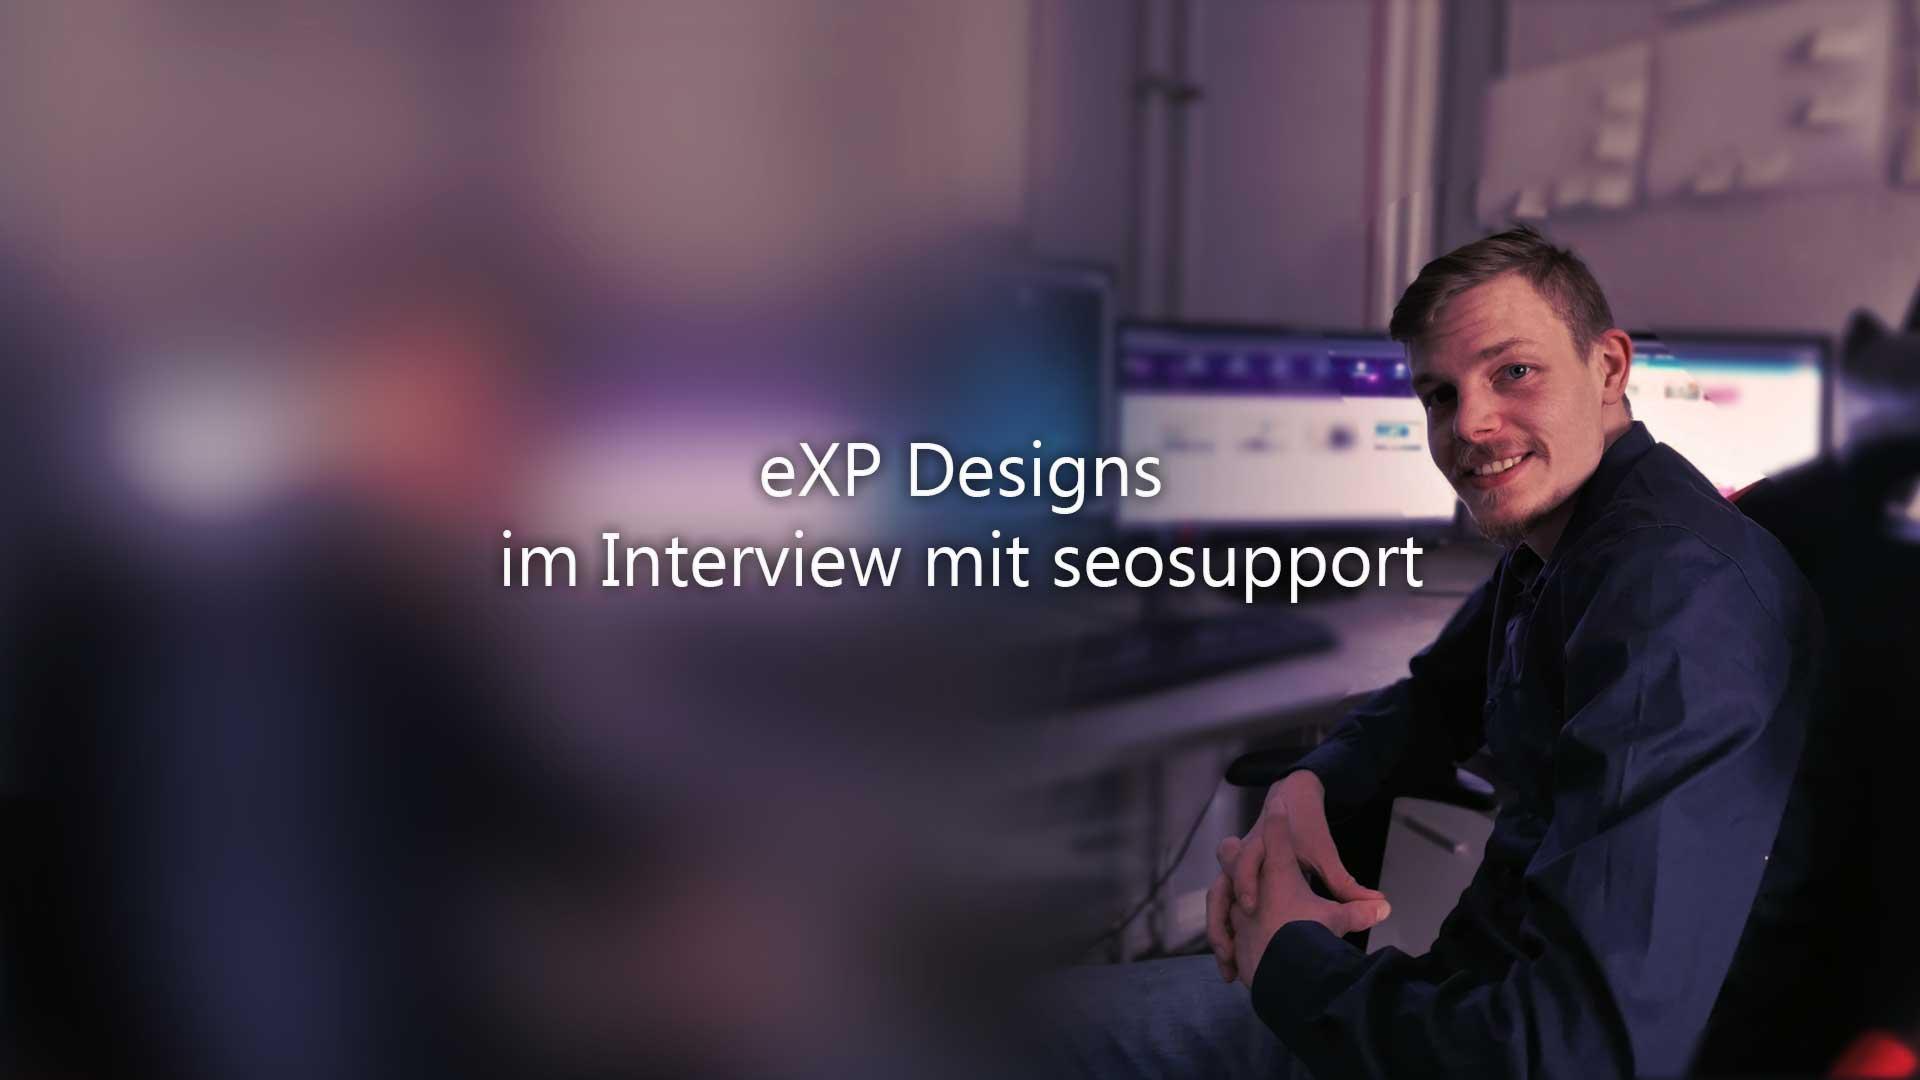 Interview mit seosupport eXP Designs SEO Berlin